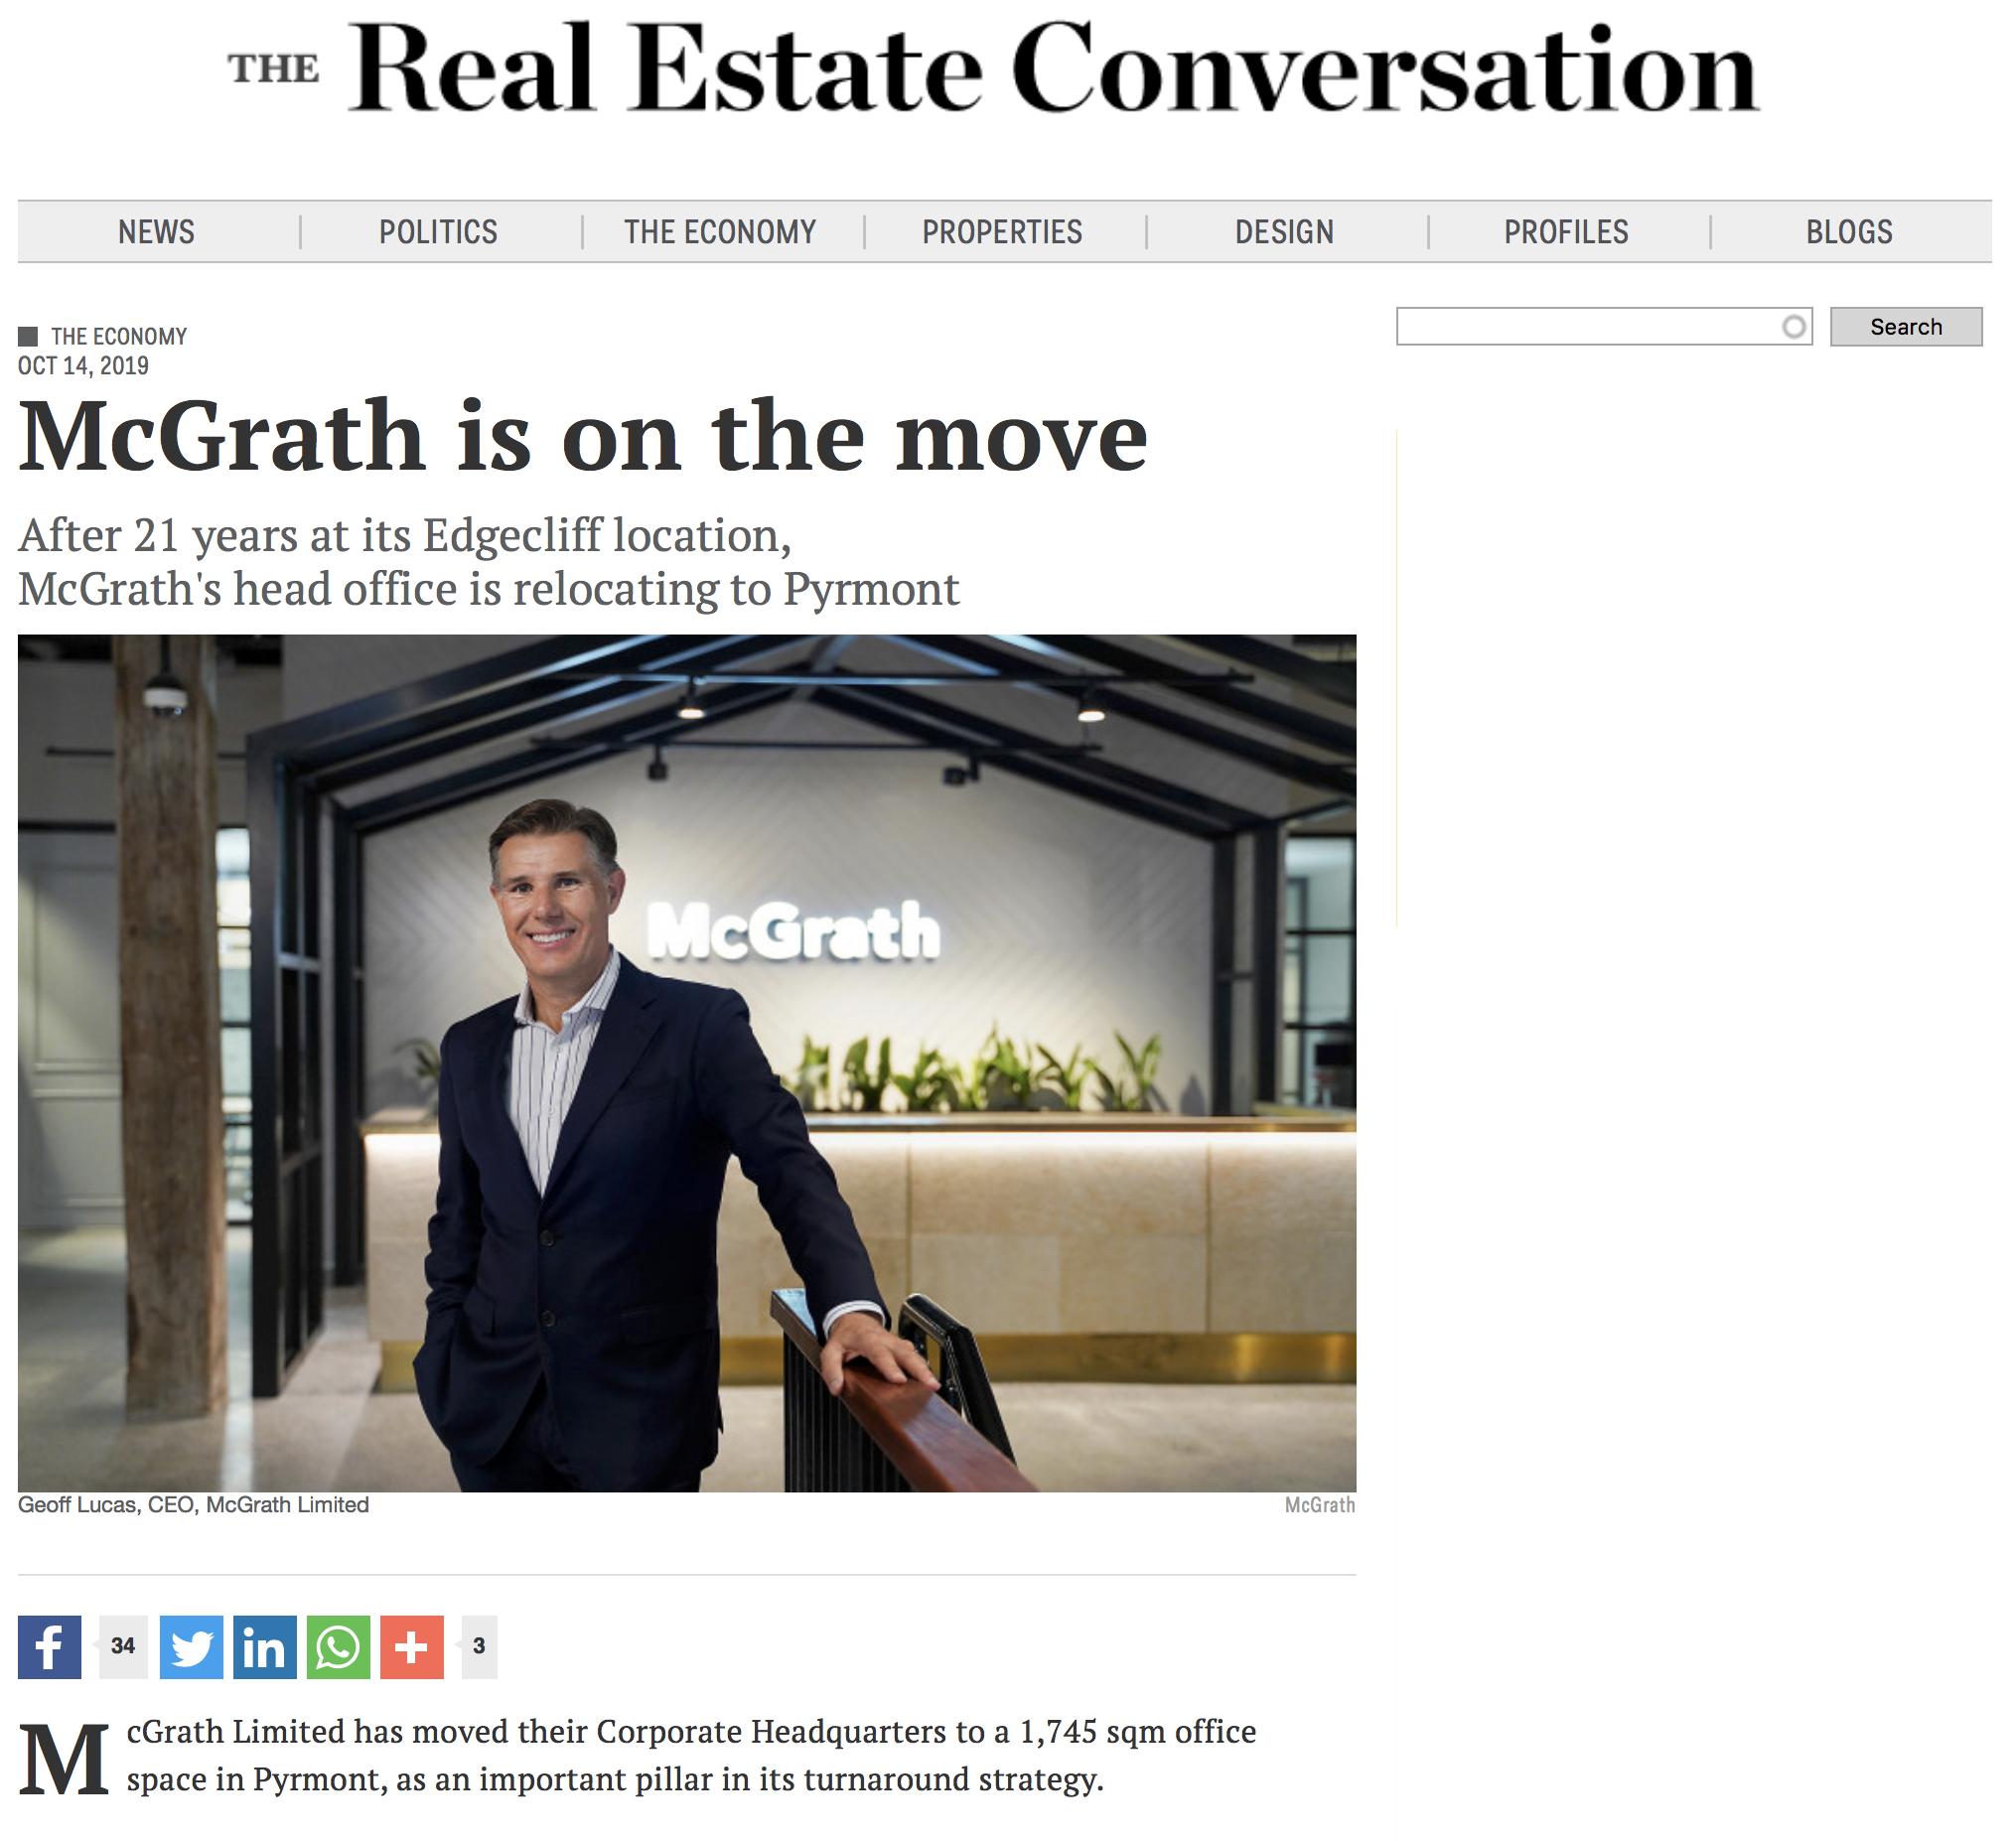 The Real Estate Conversation_McGrath.png